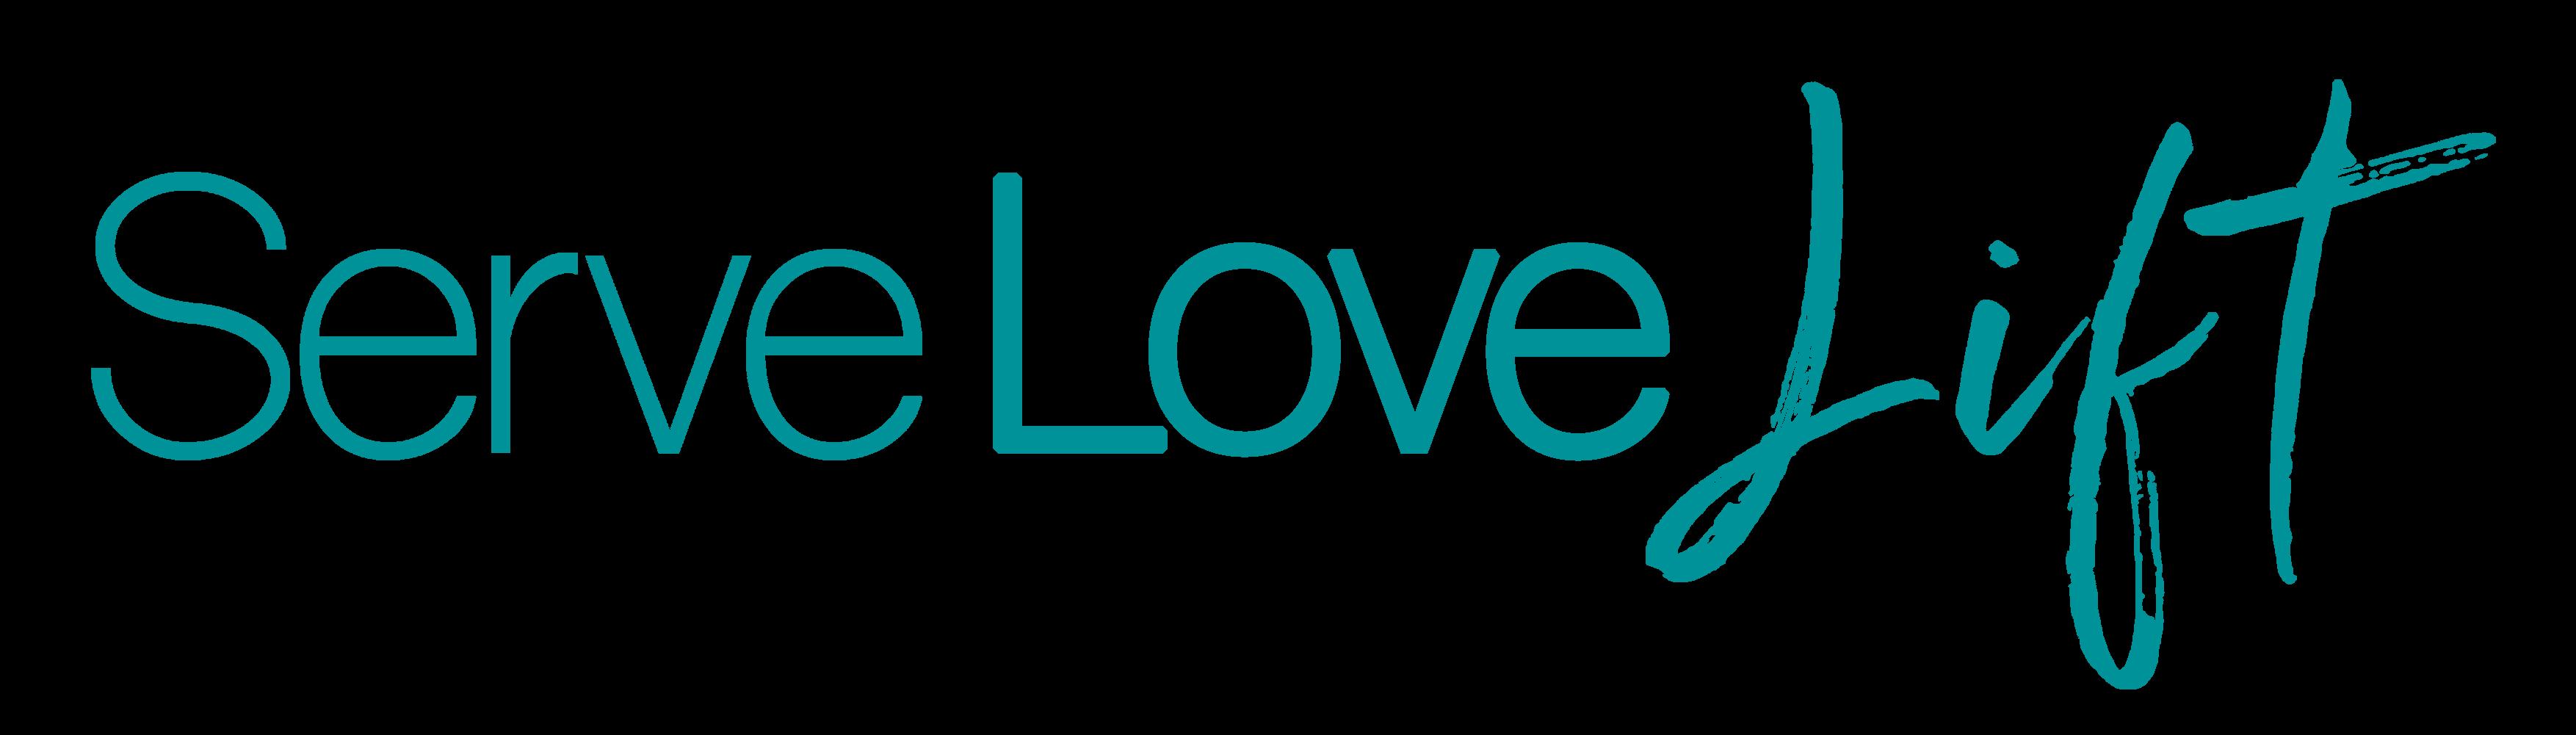 Serve Love Lift